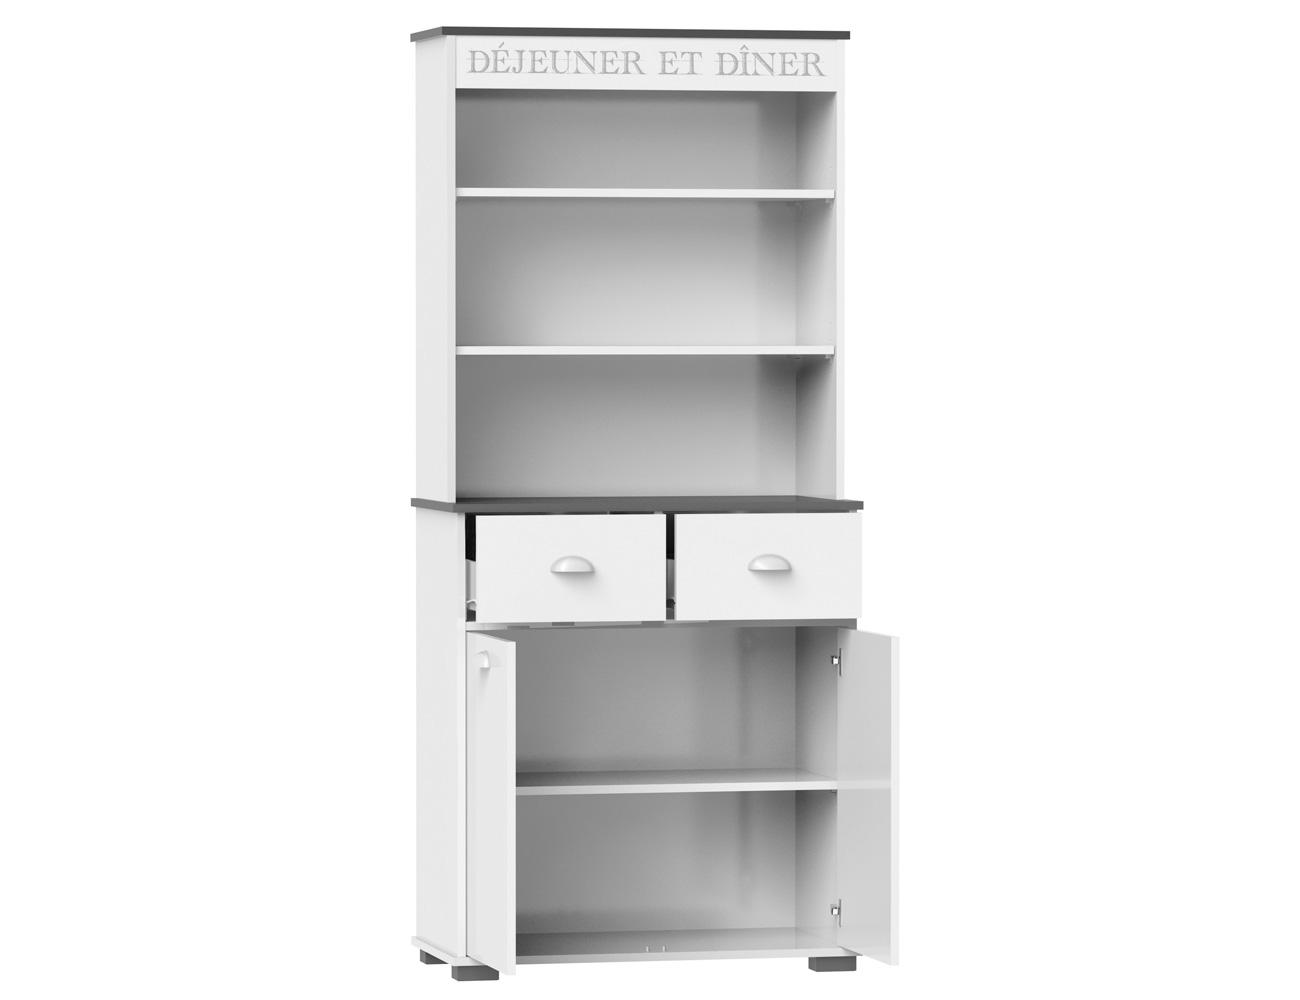 Mueble buffet de cocina de 180 cm de alto 3416 factory for Manual para muebles de cocina